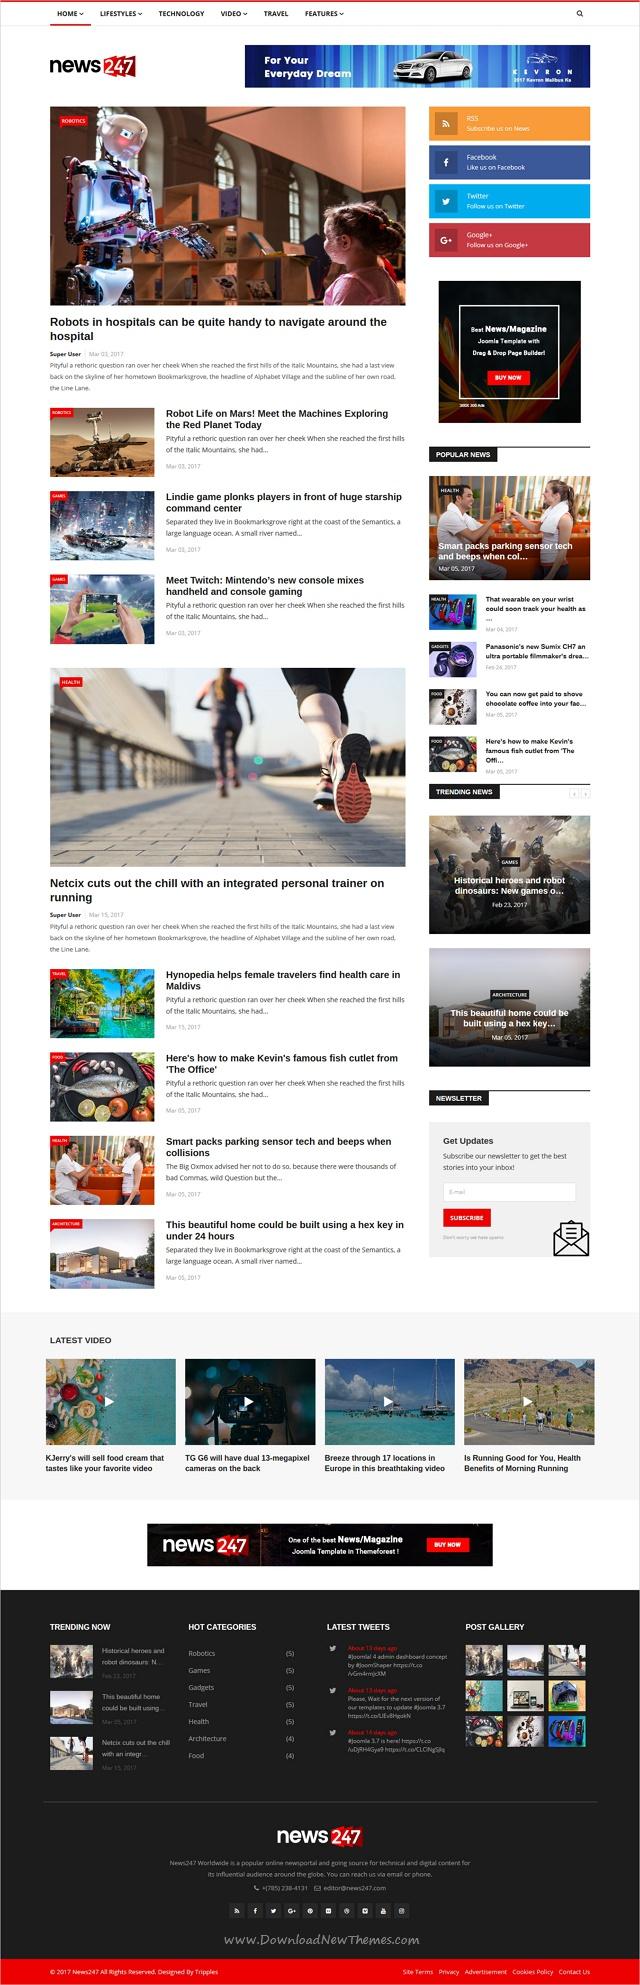 News247 Newsmagazine Newspaper Joomla Template Pinterest